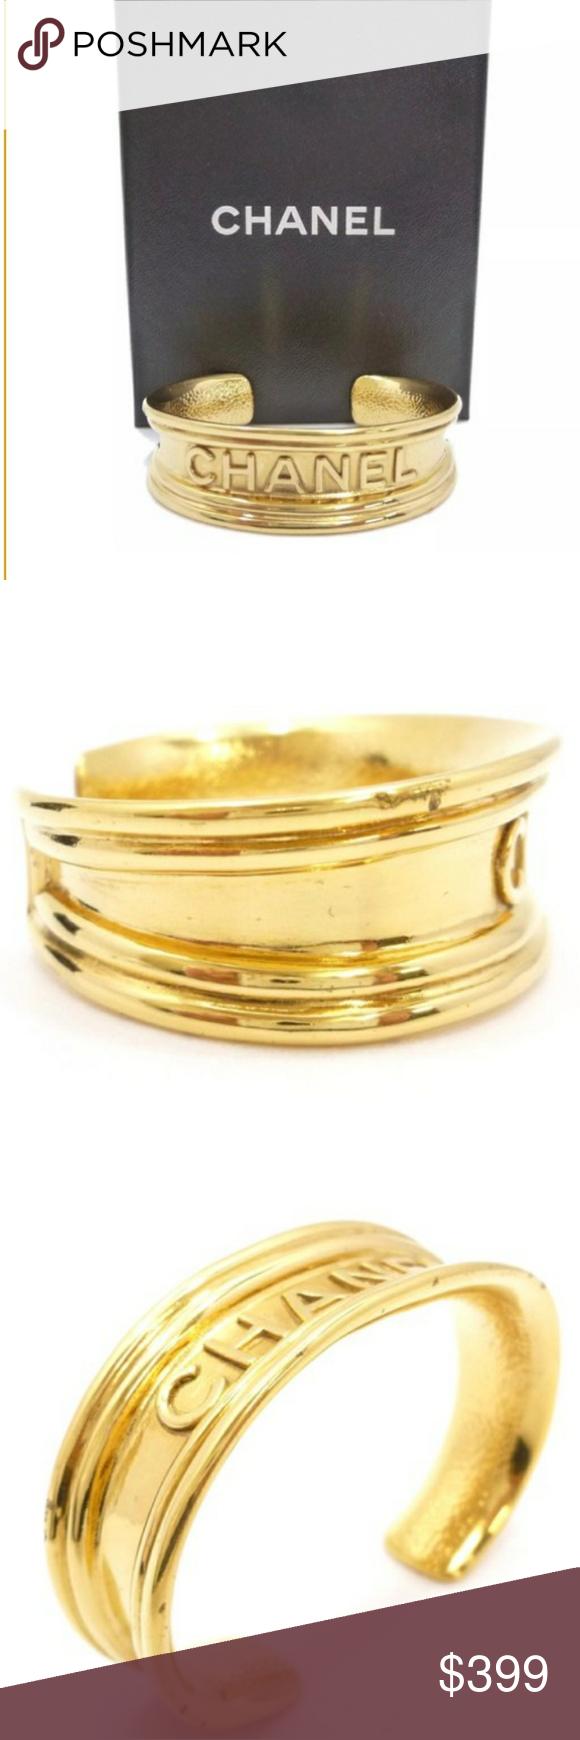 Vintage 1980's Chanel Gold Plated Cuff Bracelet